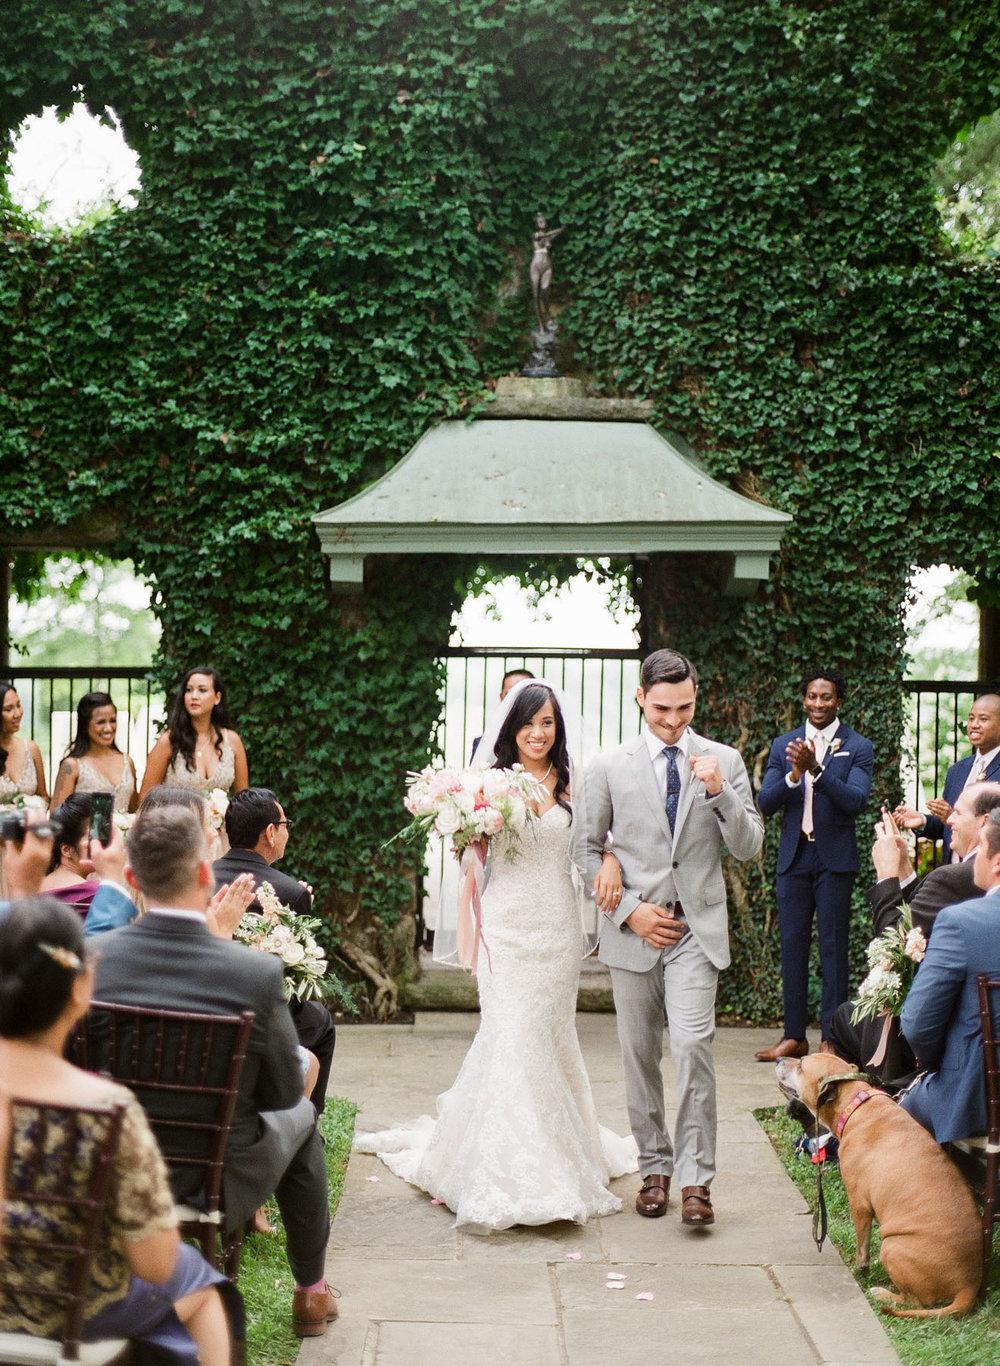 Virginia-Film-Photographer-Wedding-39.jpg